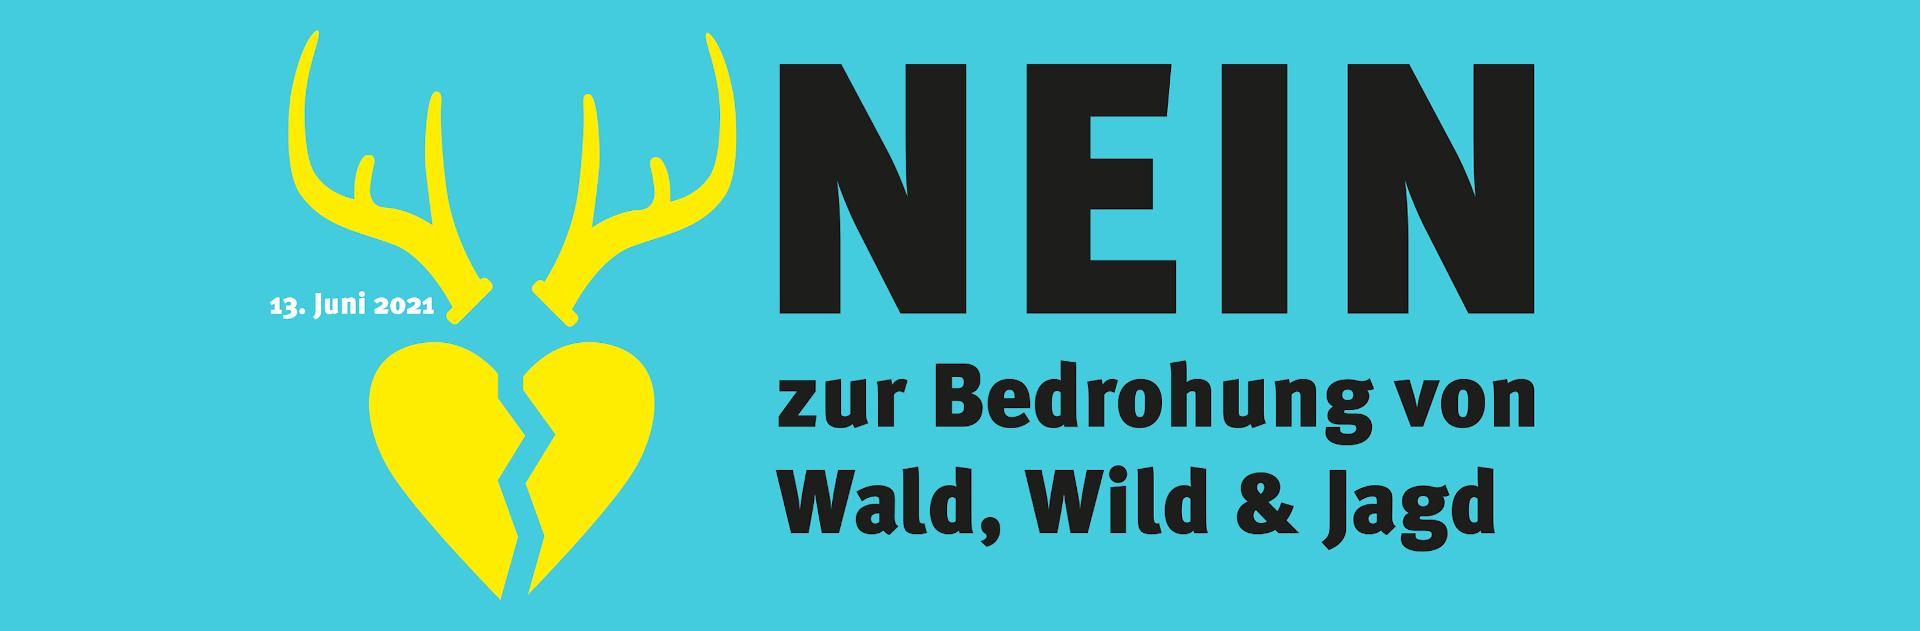 Jagd_NEIN Kampagne_Webheader_0